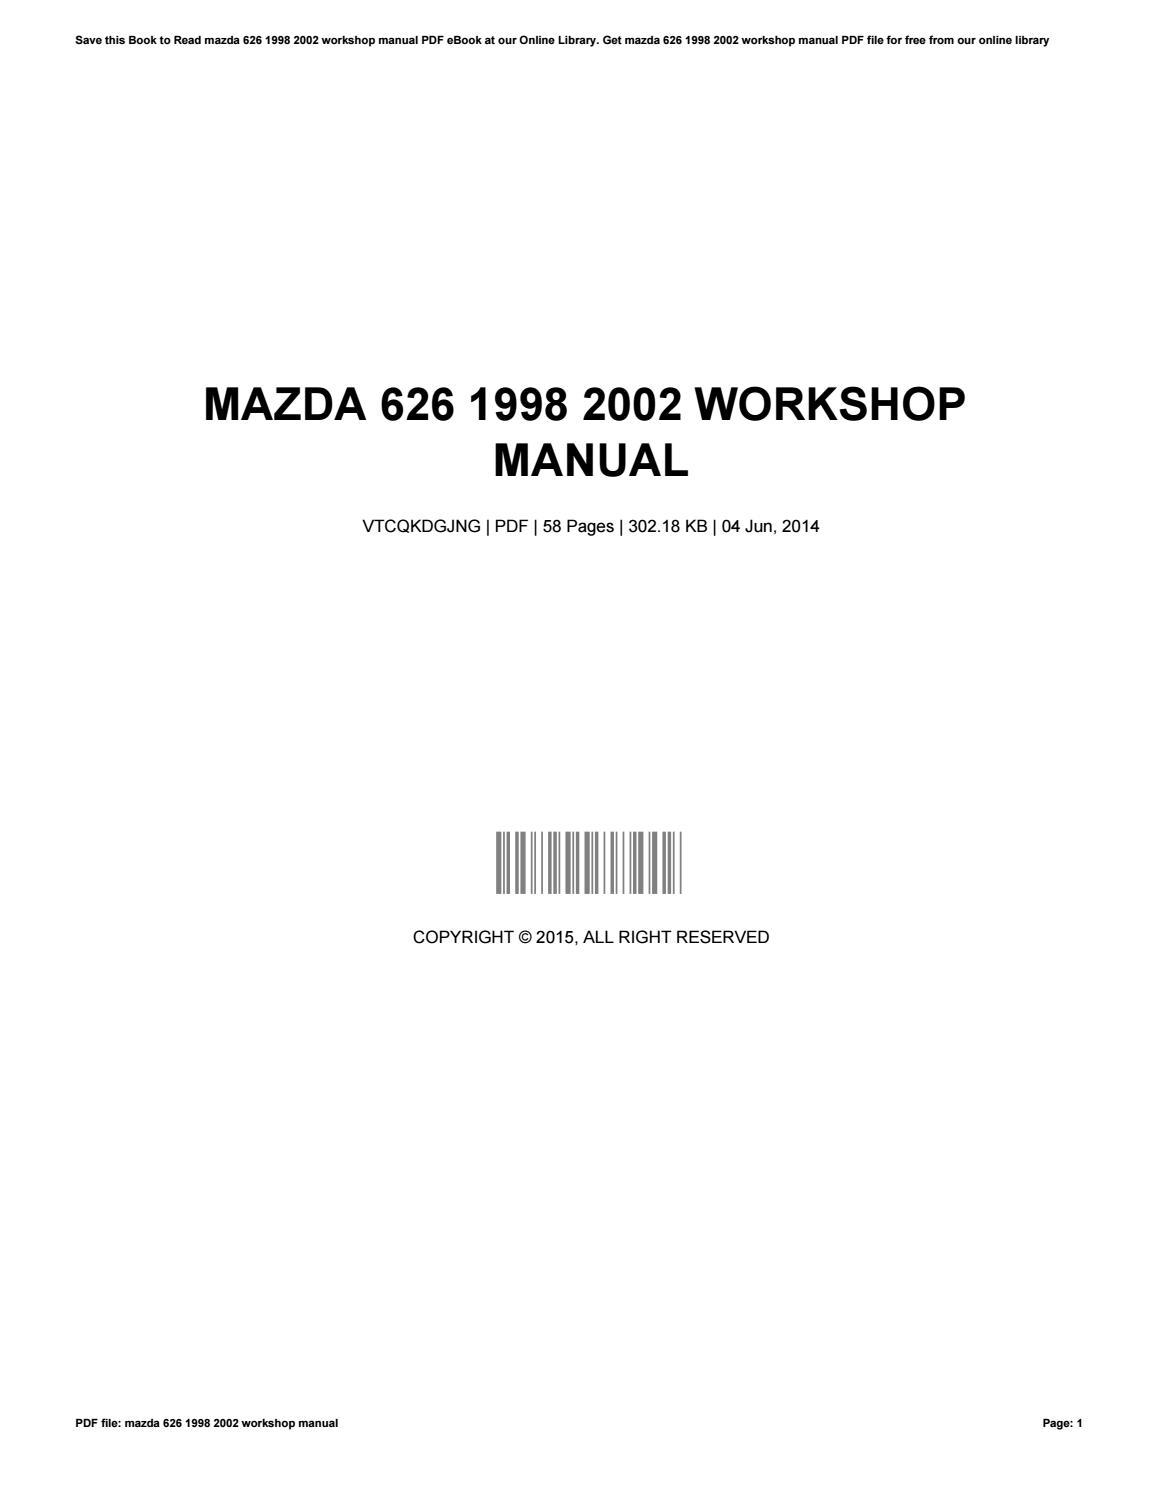 02 mazda 626 owners manual pdf ebook